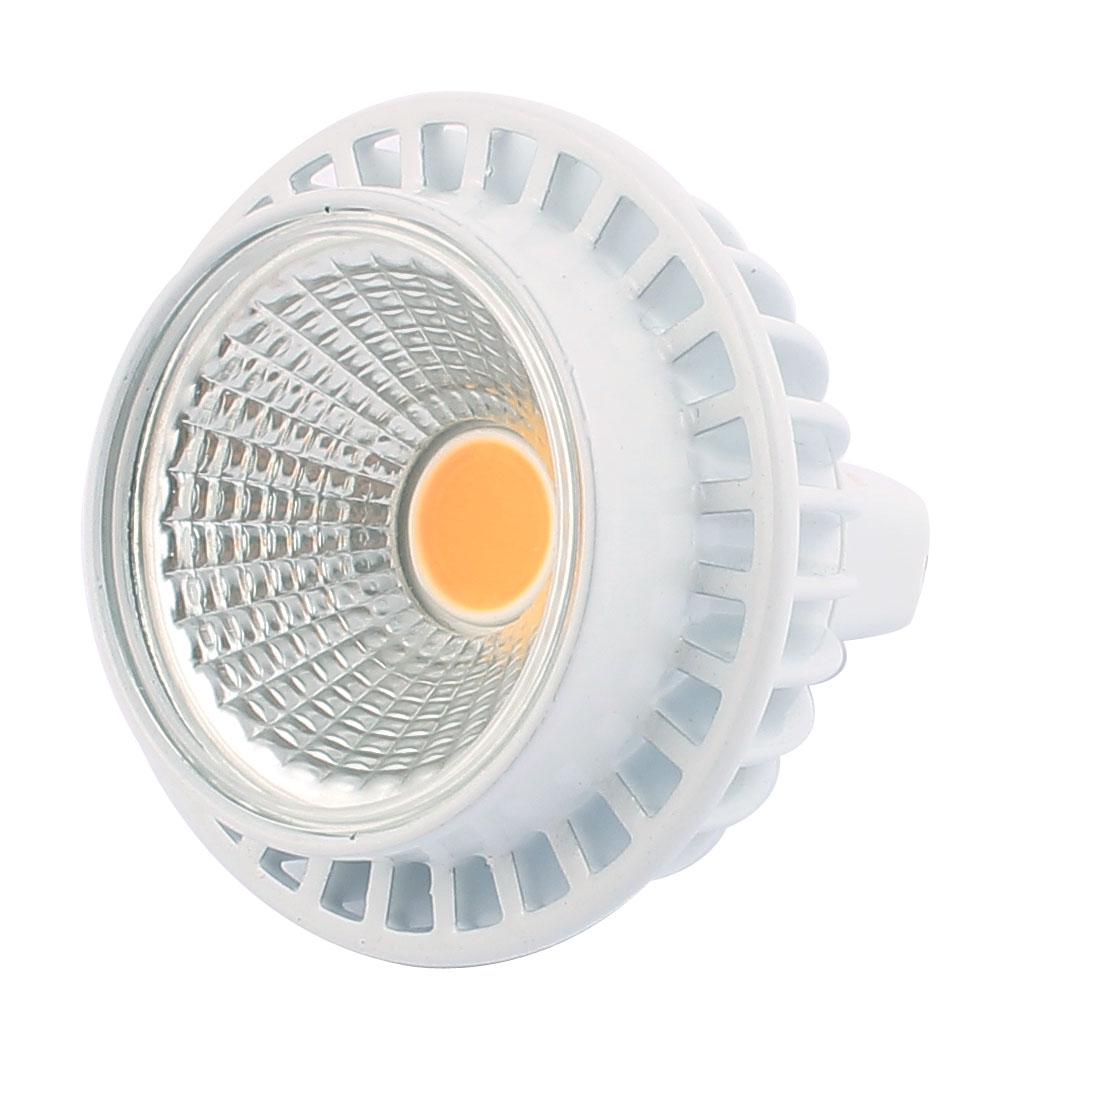 DC12V 3W MR16 COB LED Spotlight Lamp Bulb Practical Downlight Warm White